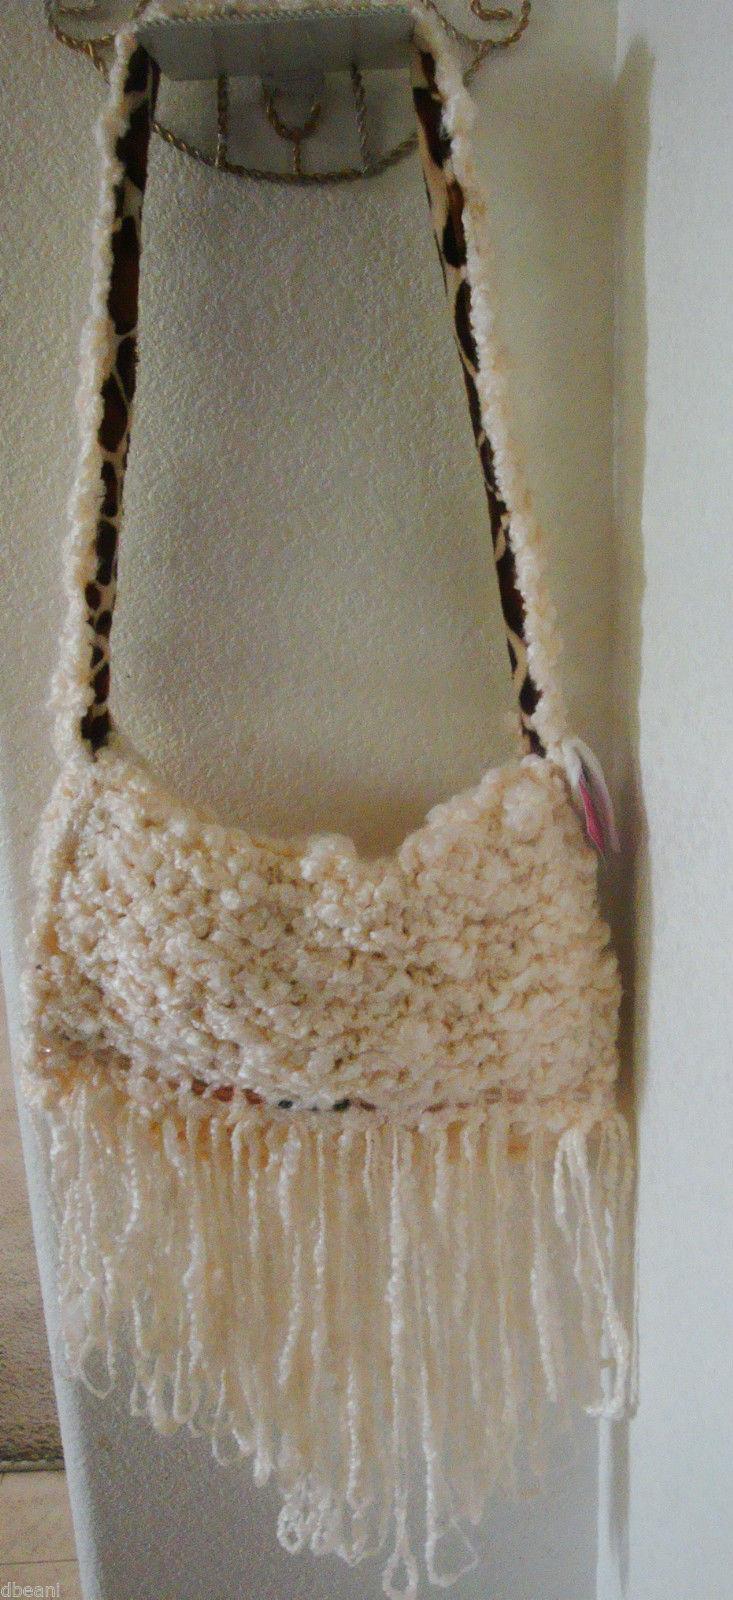 Cream Yarn Knit w Fringe & Beads Giraffe Print Lined Handbag  Bag Hag By Jessica